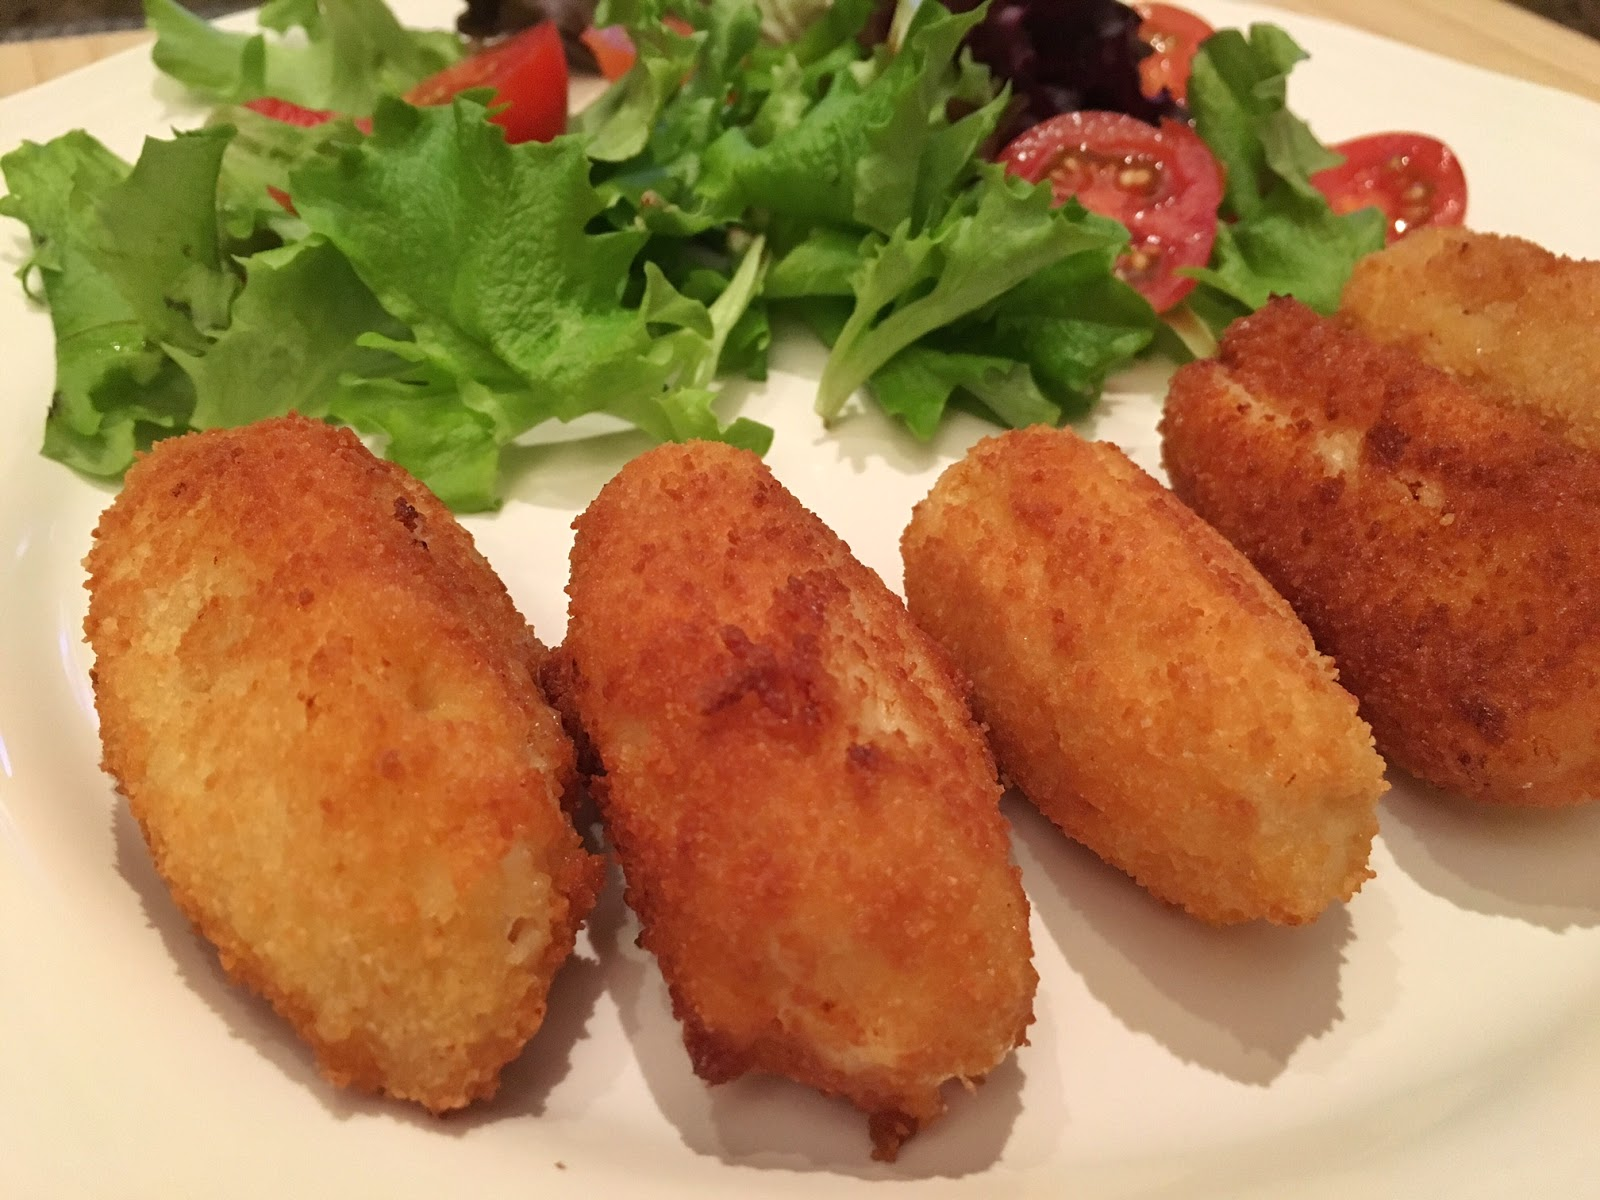 Croquetas de jamón con huevo duro